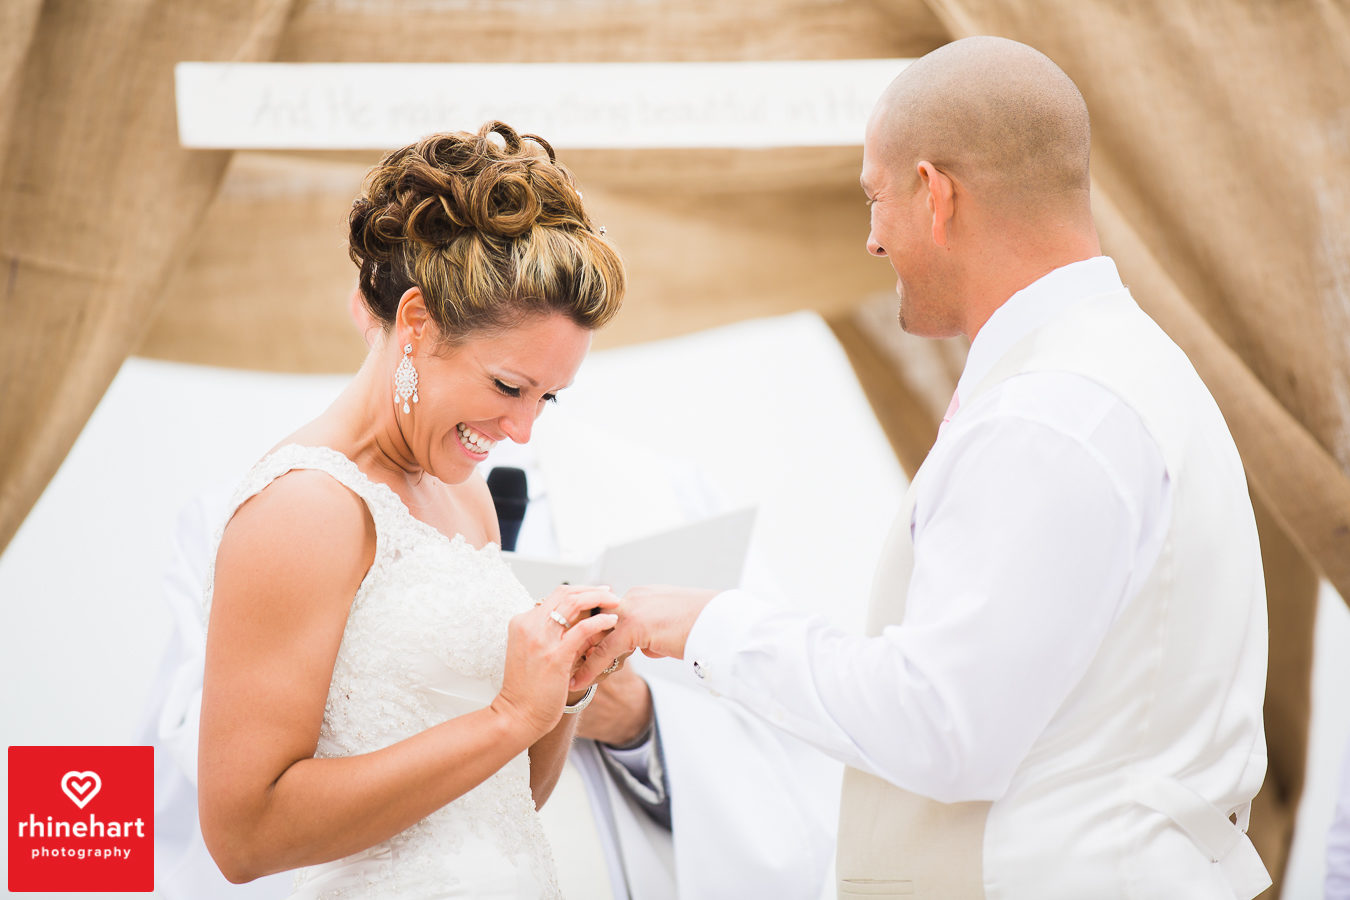 reeds-stone-harbor-wedding-photographer-120